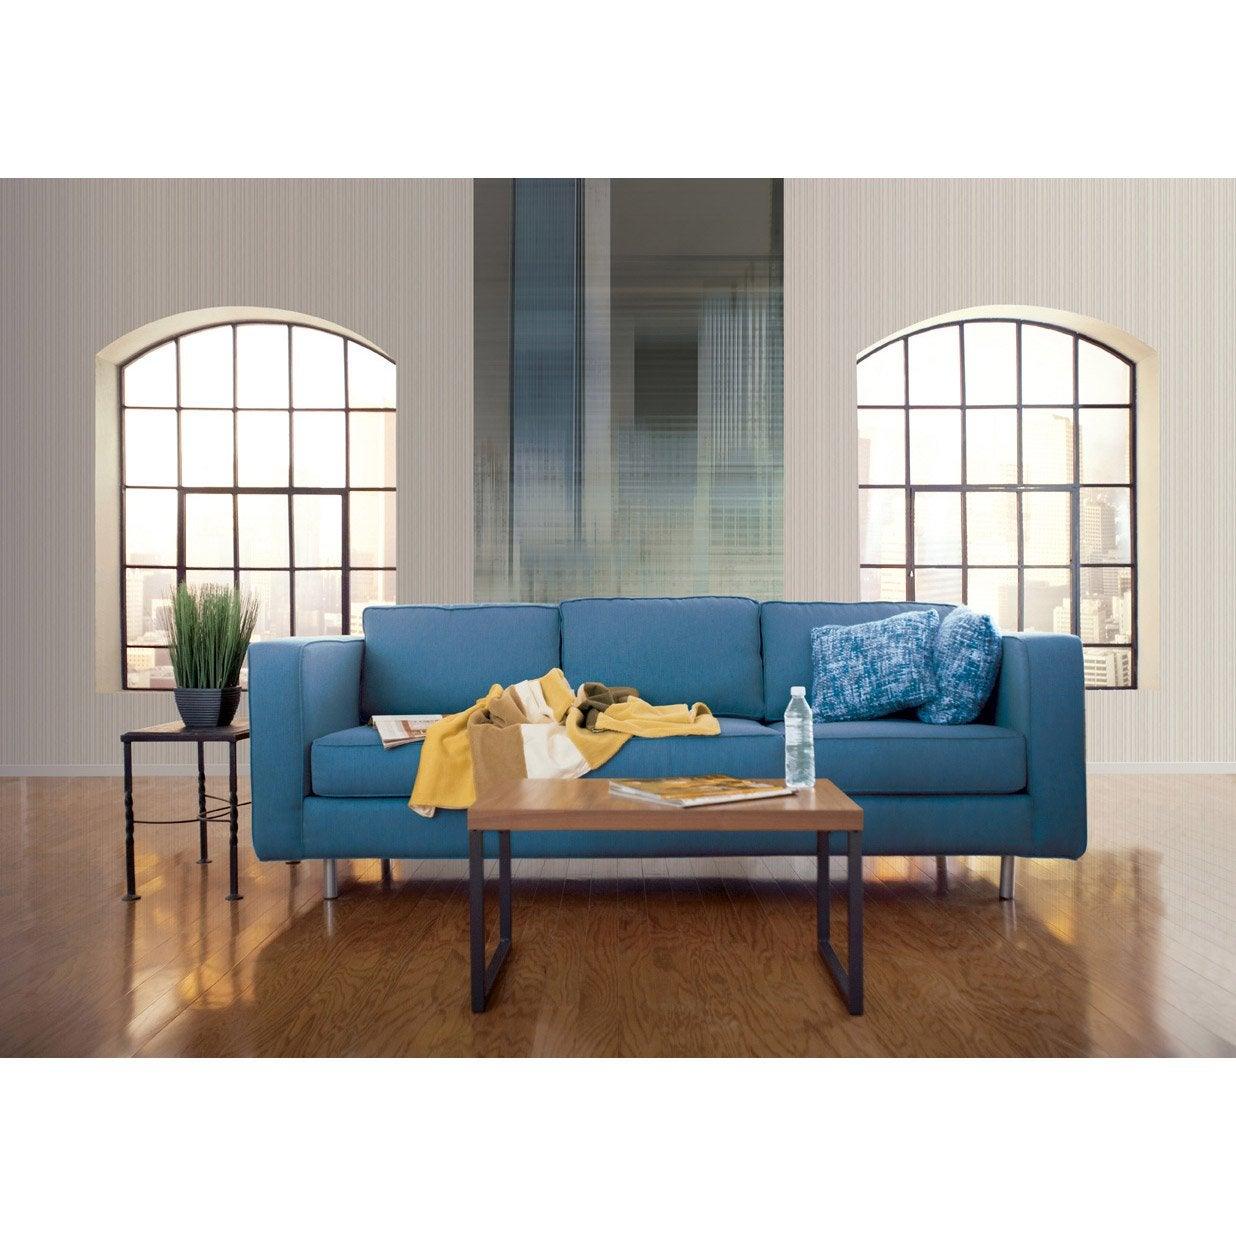 papier peint bleu gris intiss italian color leroy merlin. Black Bedroom Furniture Sets. Home Design Ideas